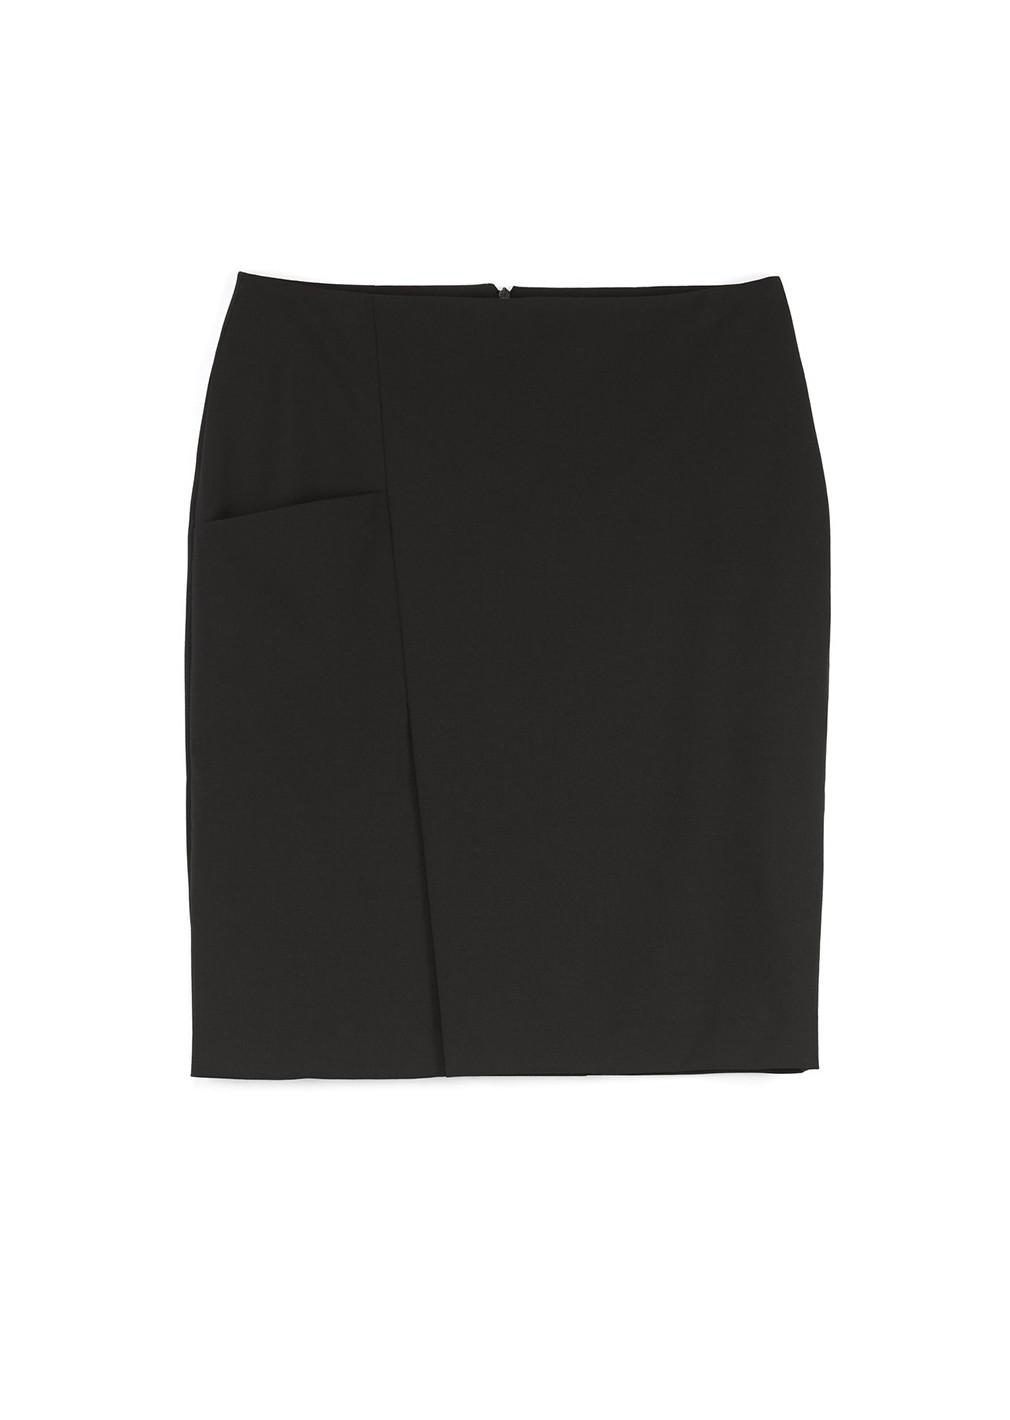 hope-two-skirt-black-front